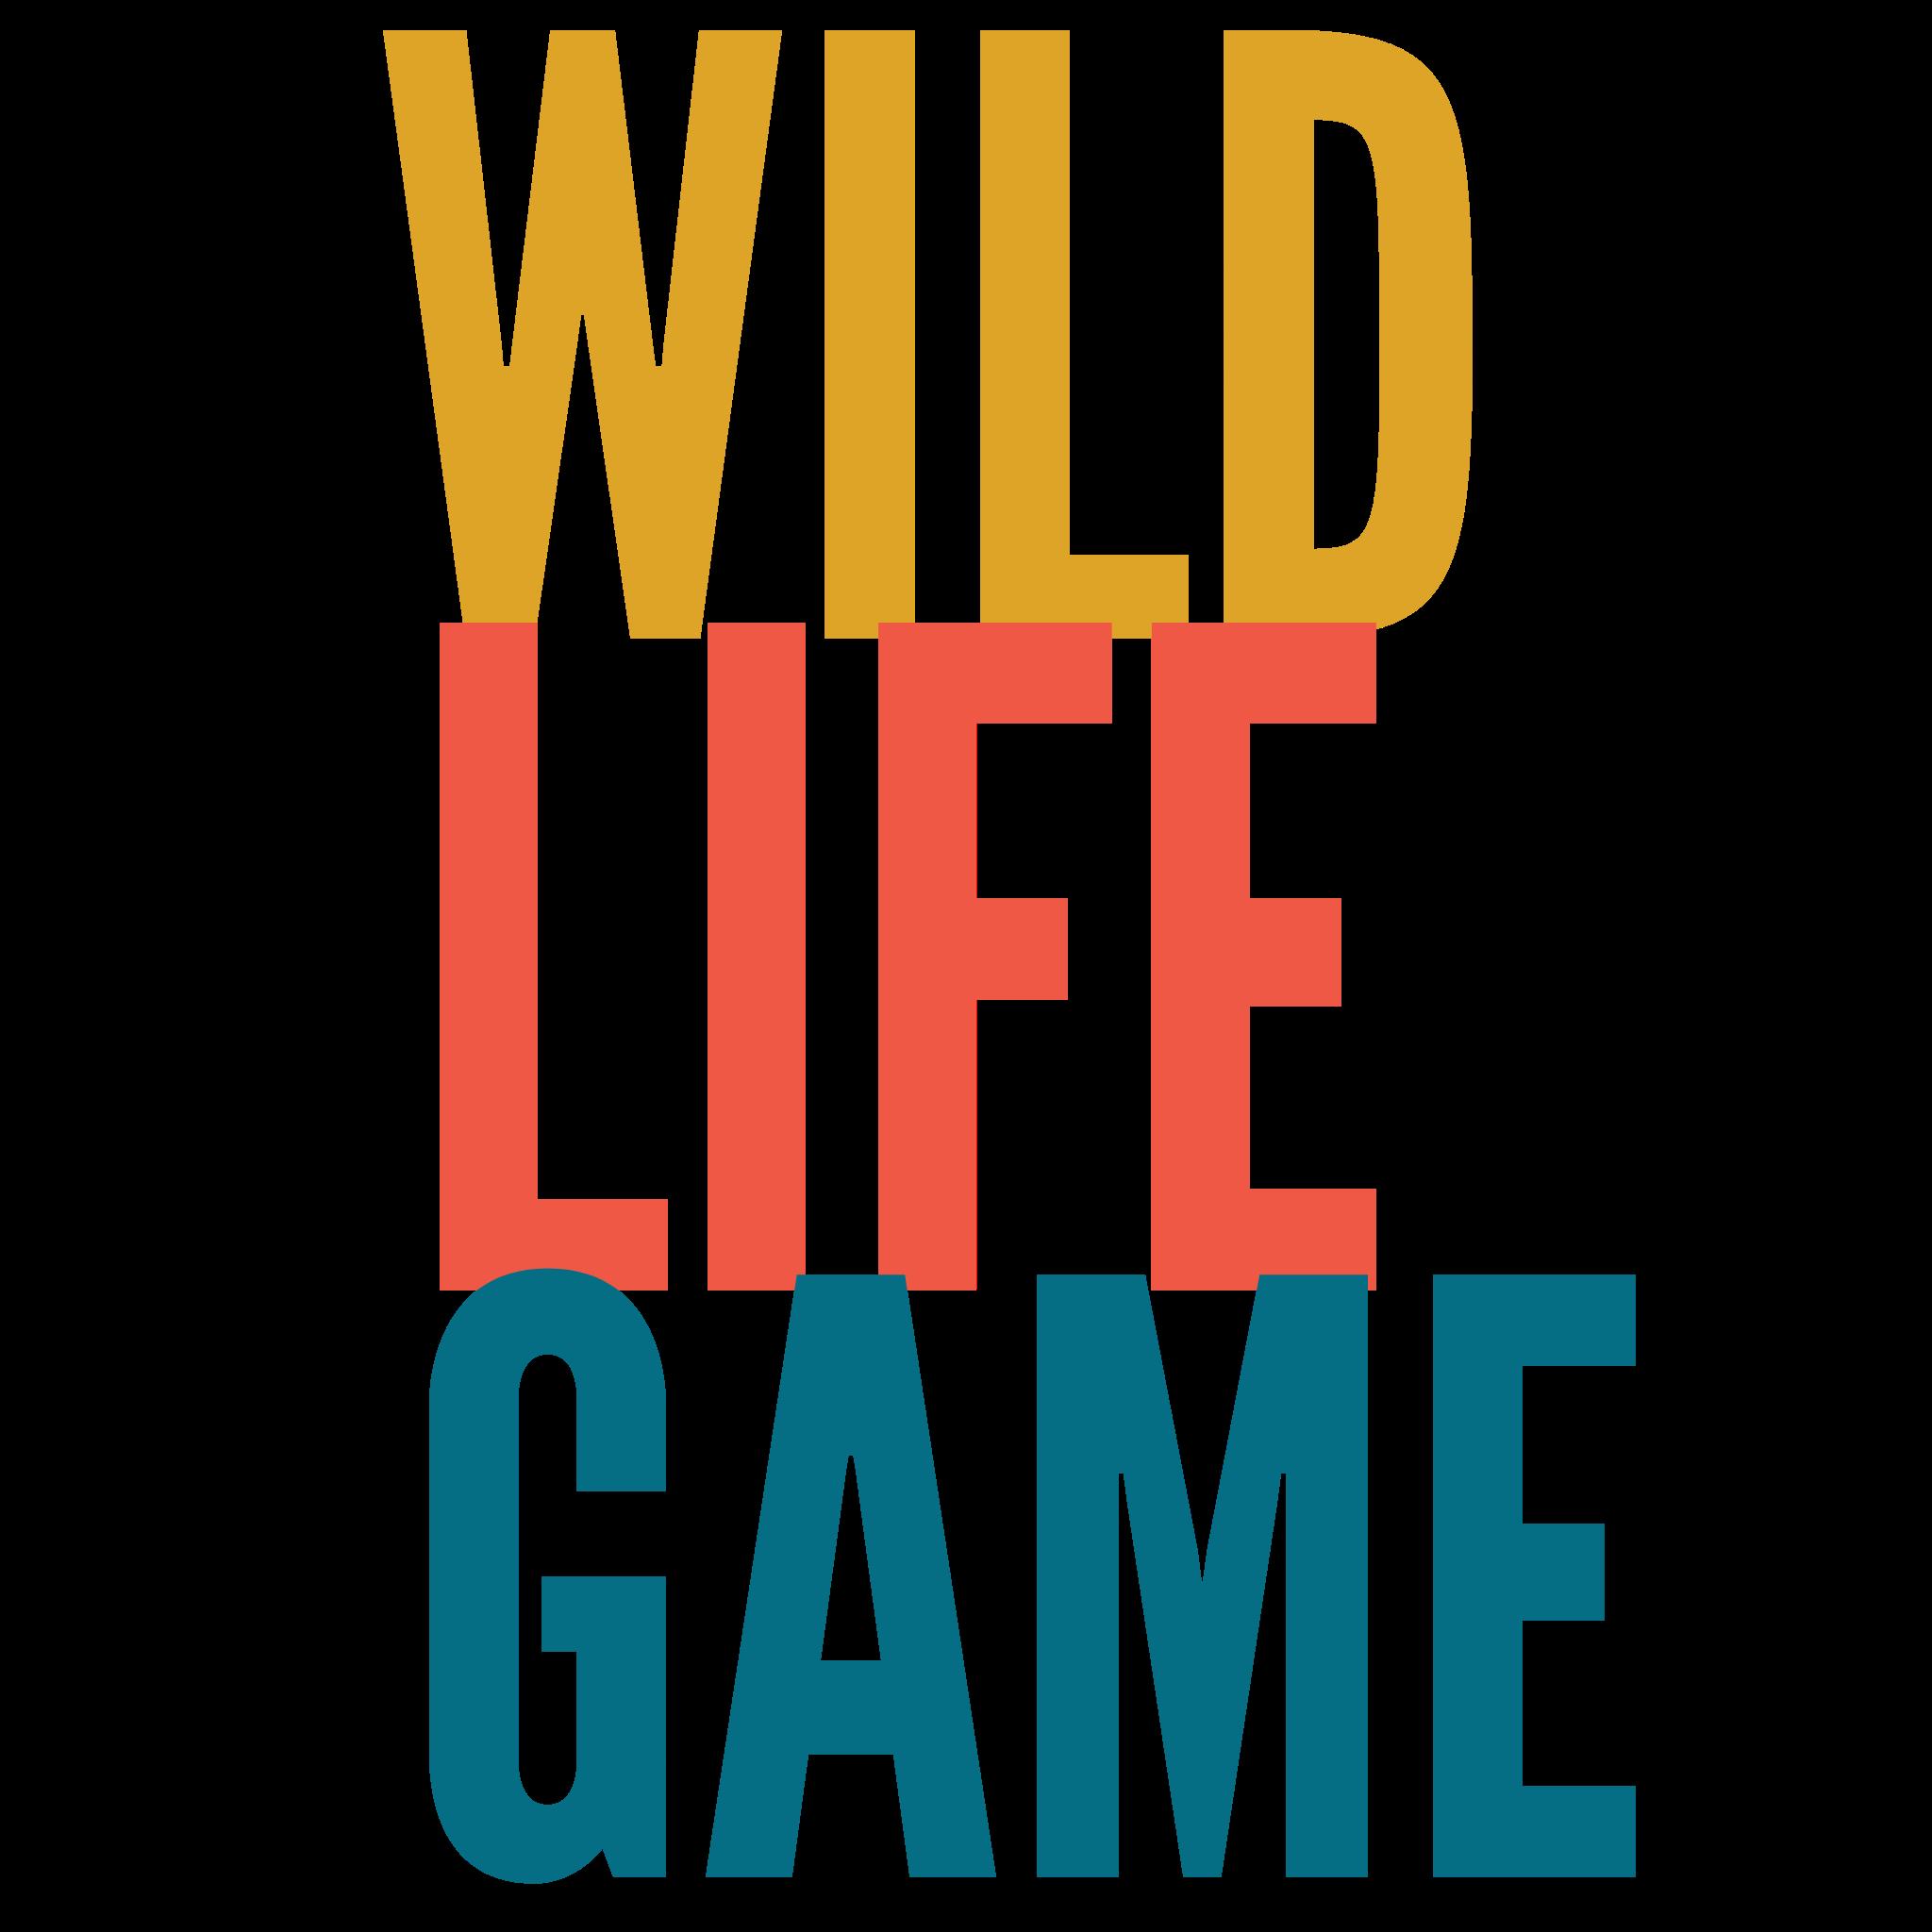 Wild Life Game Typography Design Free Download